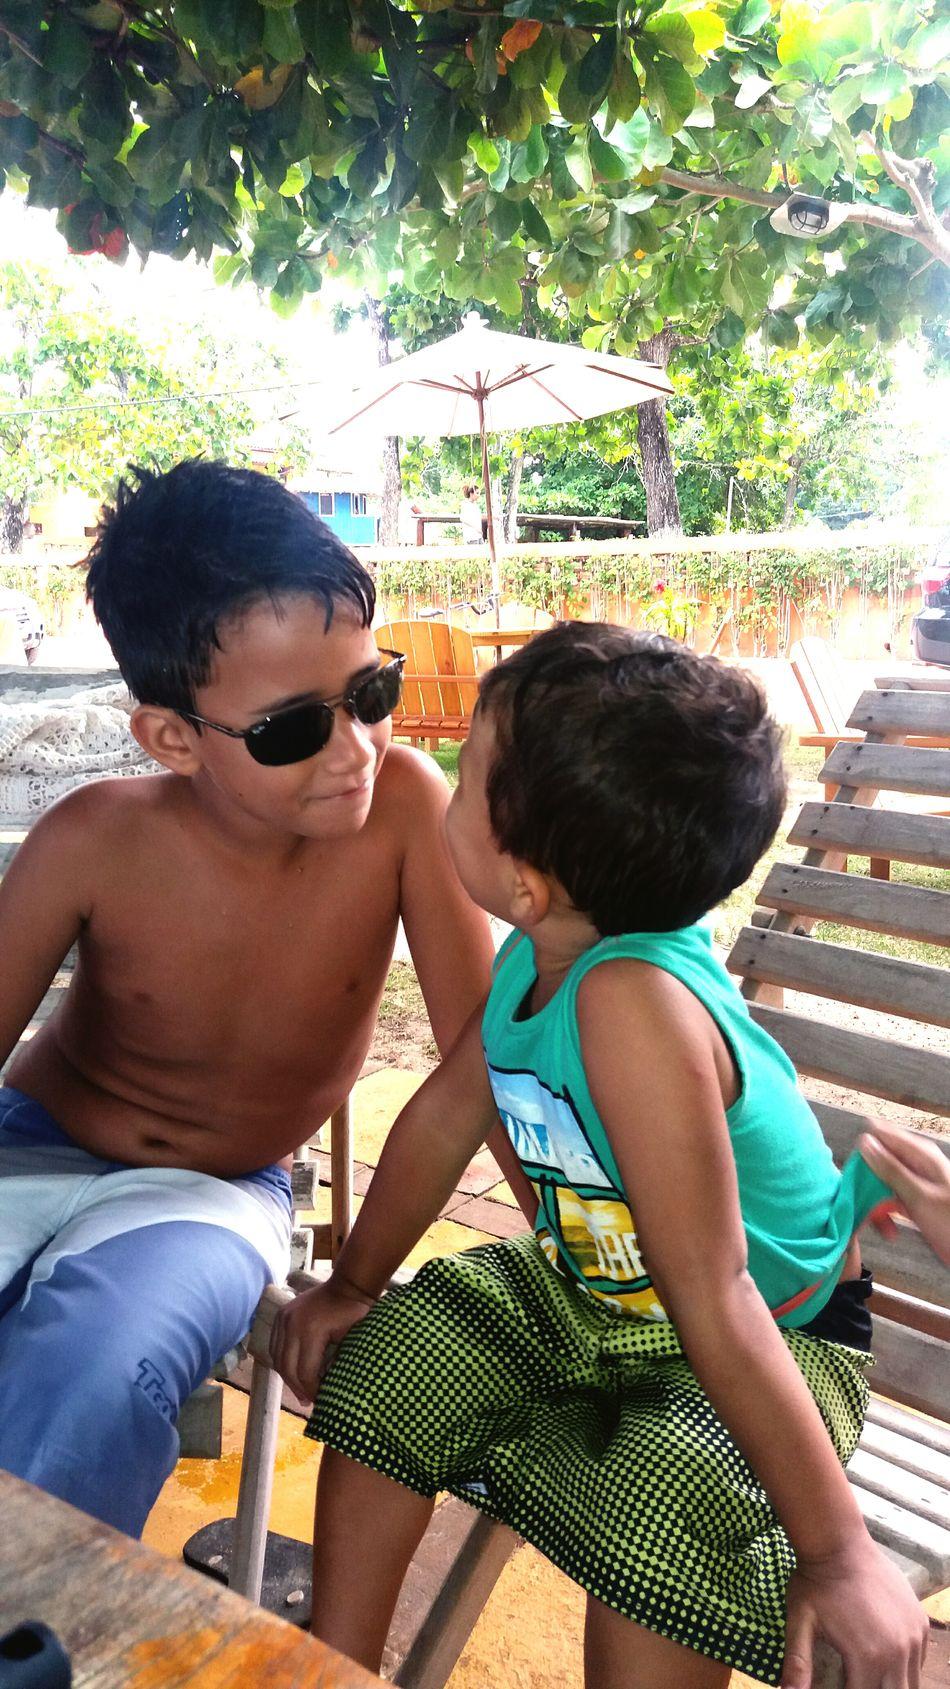 Hello World Relaxing Bahia/brazil BrasilSensacional PradoBahiaBrasil Simplicity Simply Beautiful Children